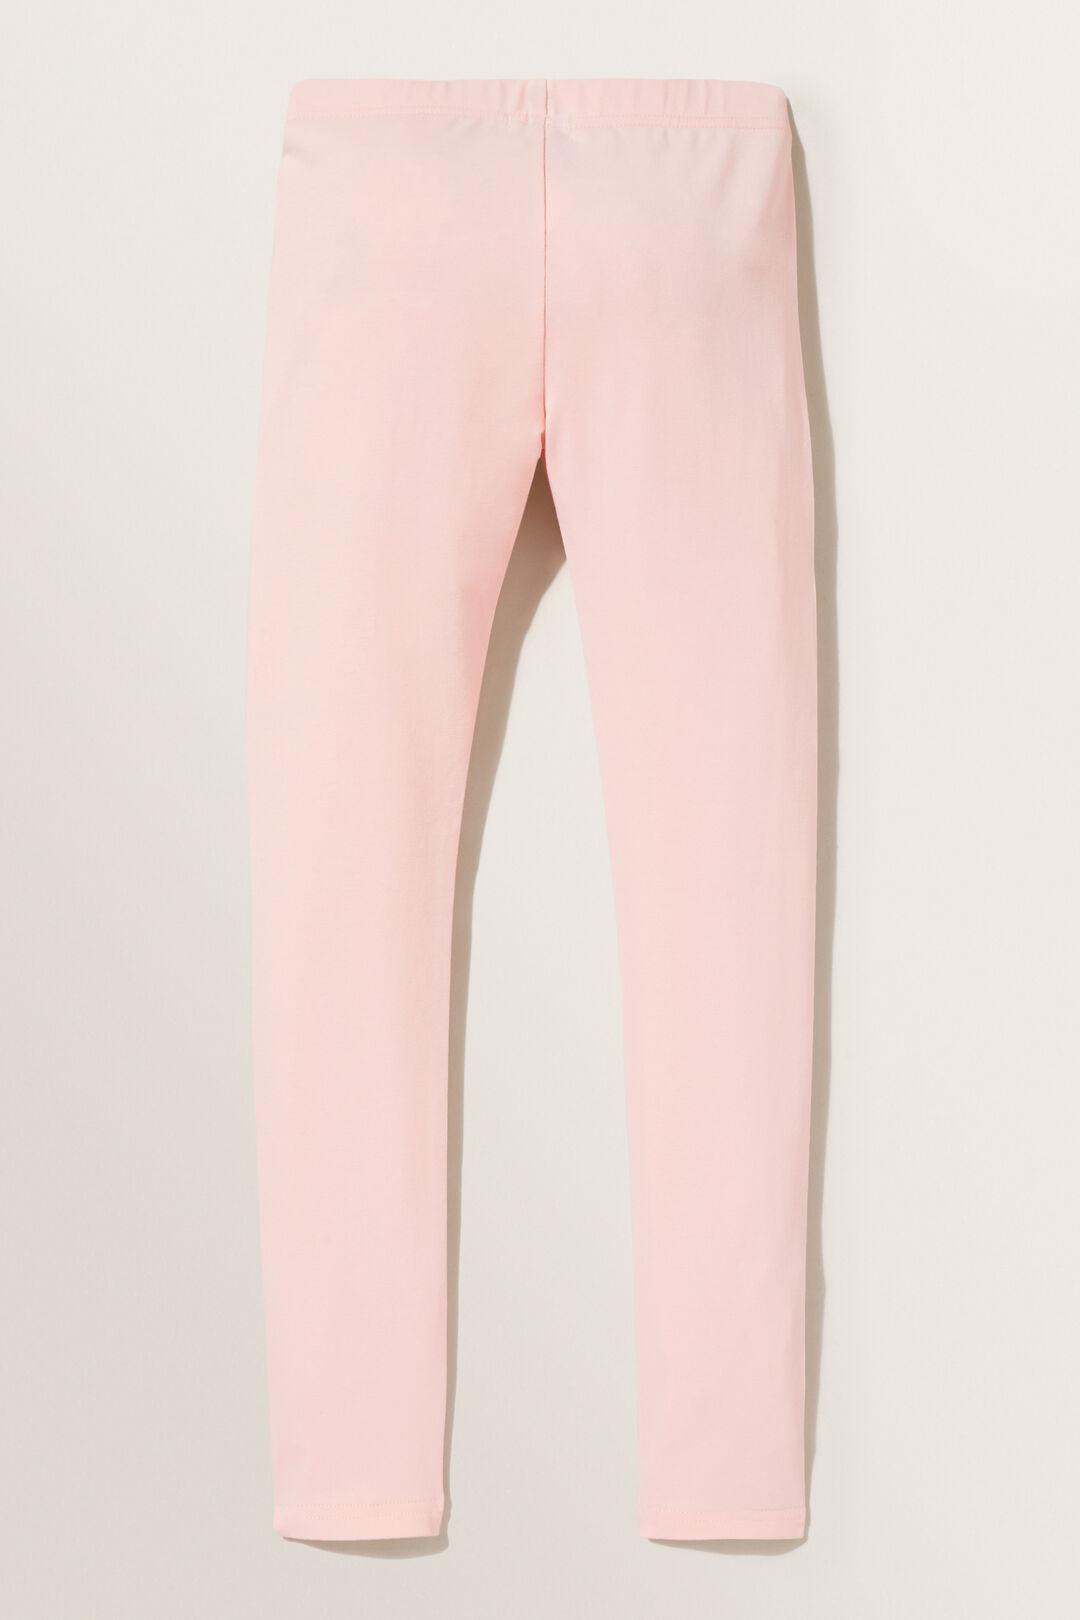 Basic Legging  Dusty Rose  hi-res